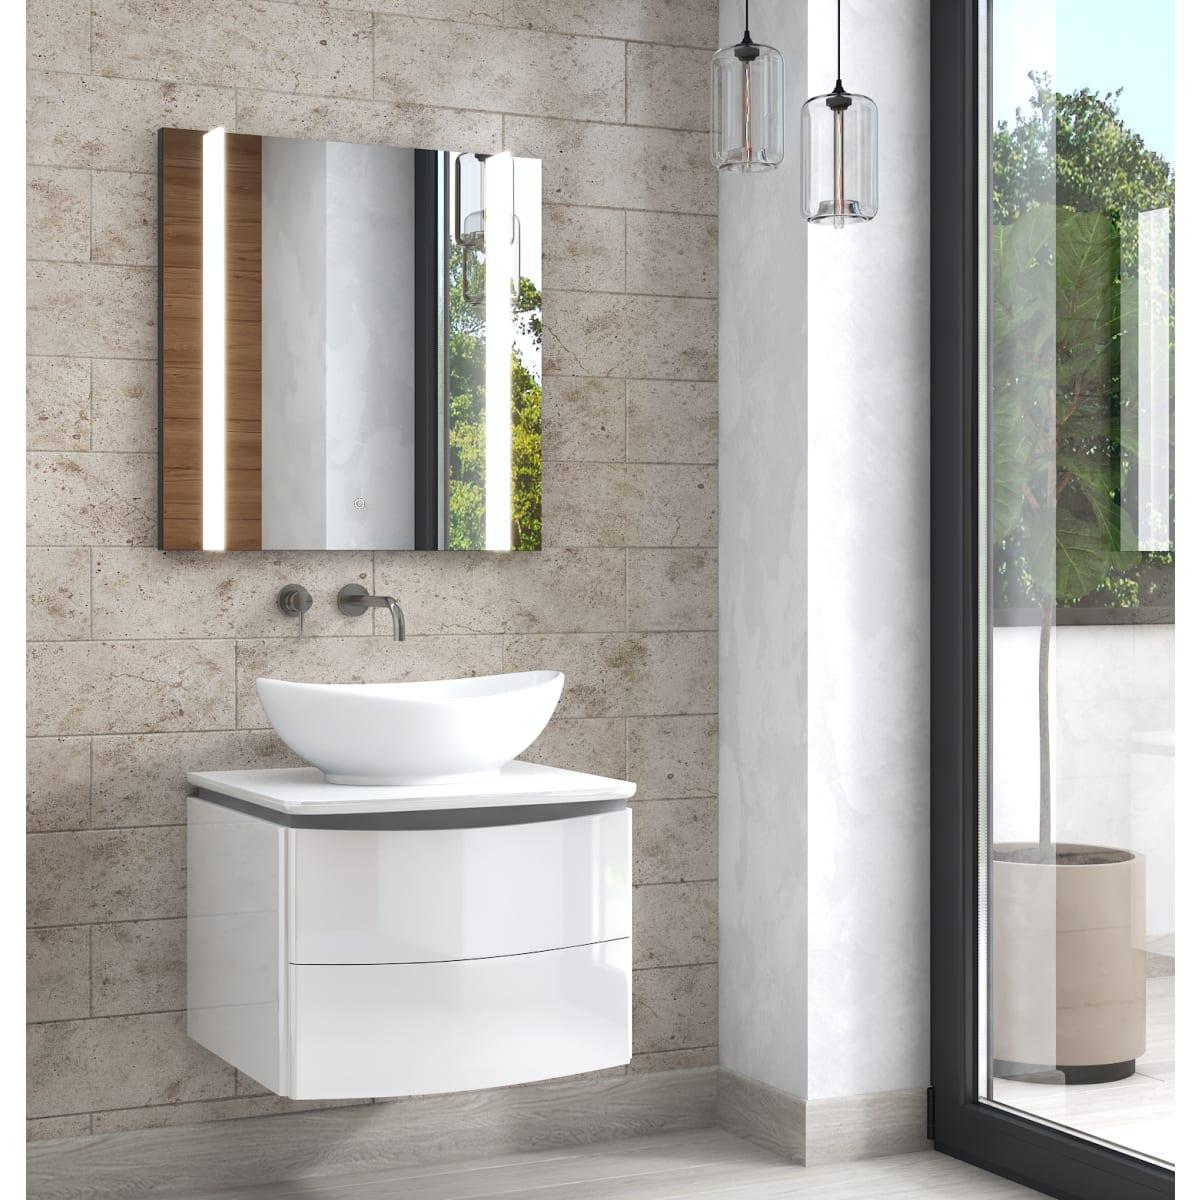 Зеркало Land с подсветкой 60x70 см